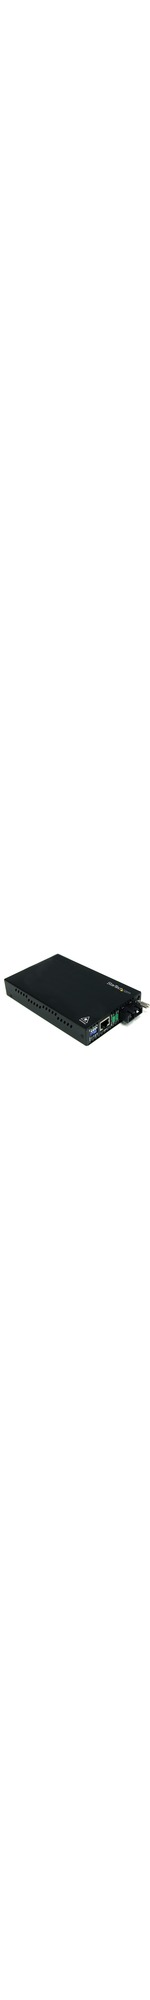 StarTech.com 10/100 Mbps Single Mode Fiber Media Converter SC 30 km - 2 Ports - 1 x SC - Twisted Pair, Fiber - 30km - Desktop, Rack-mountable